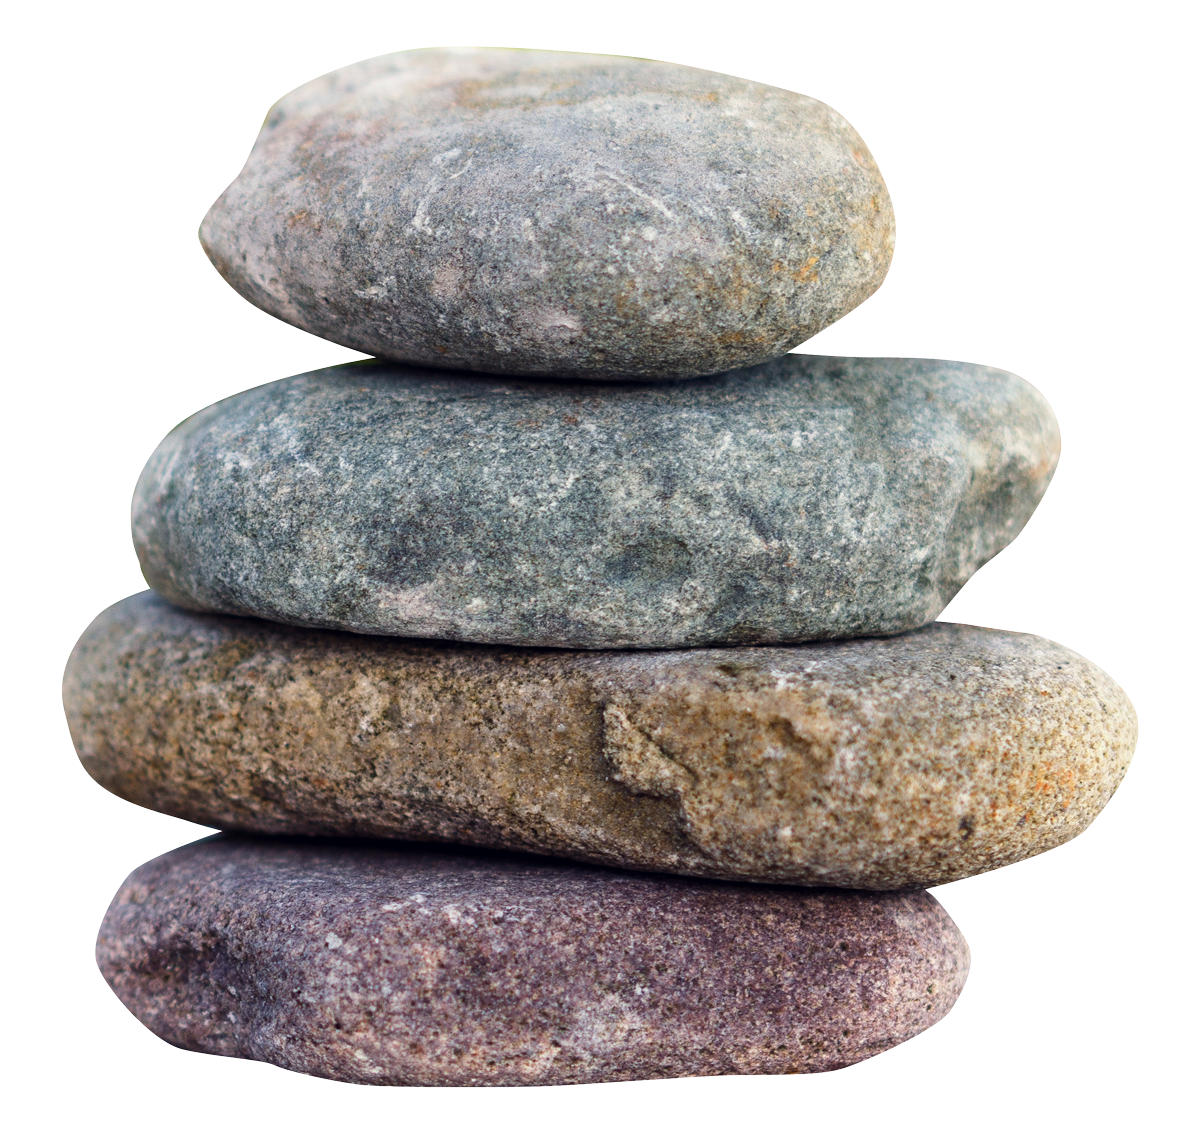 Stone PNG Transparent Image.